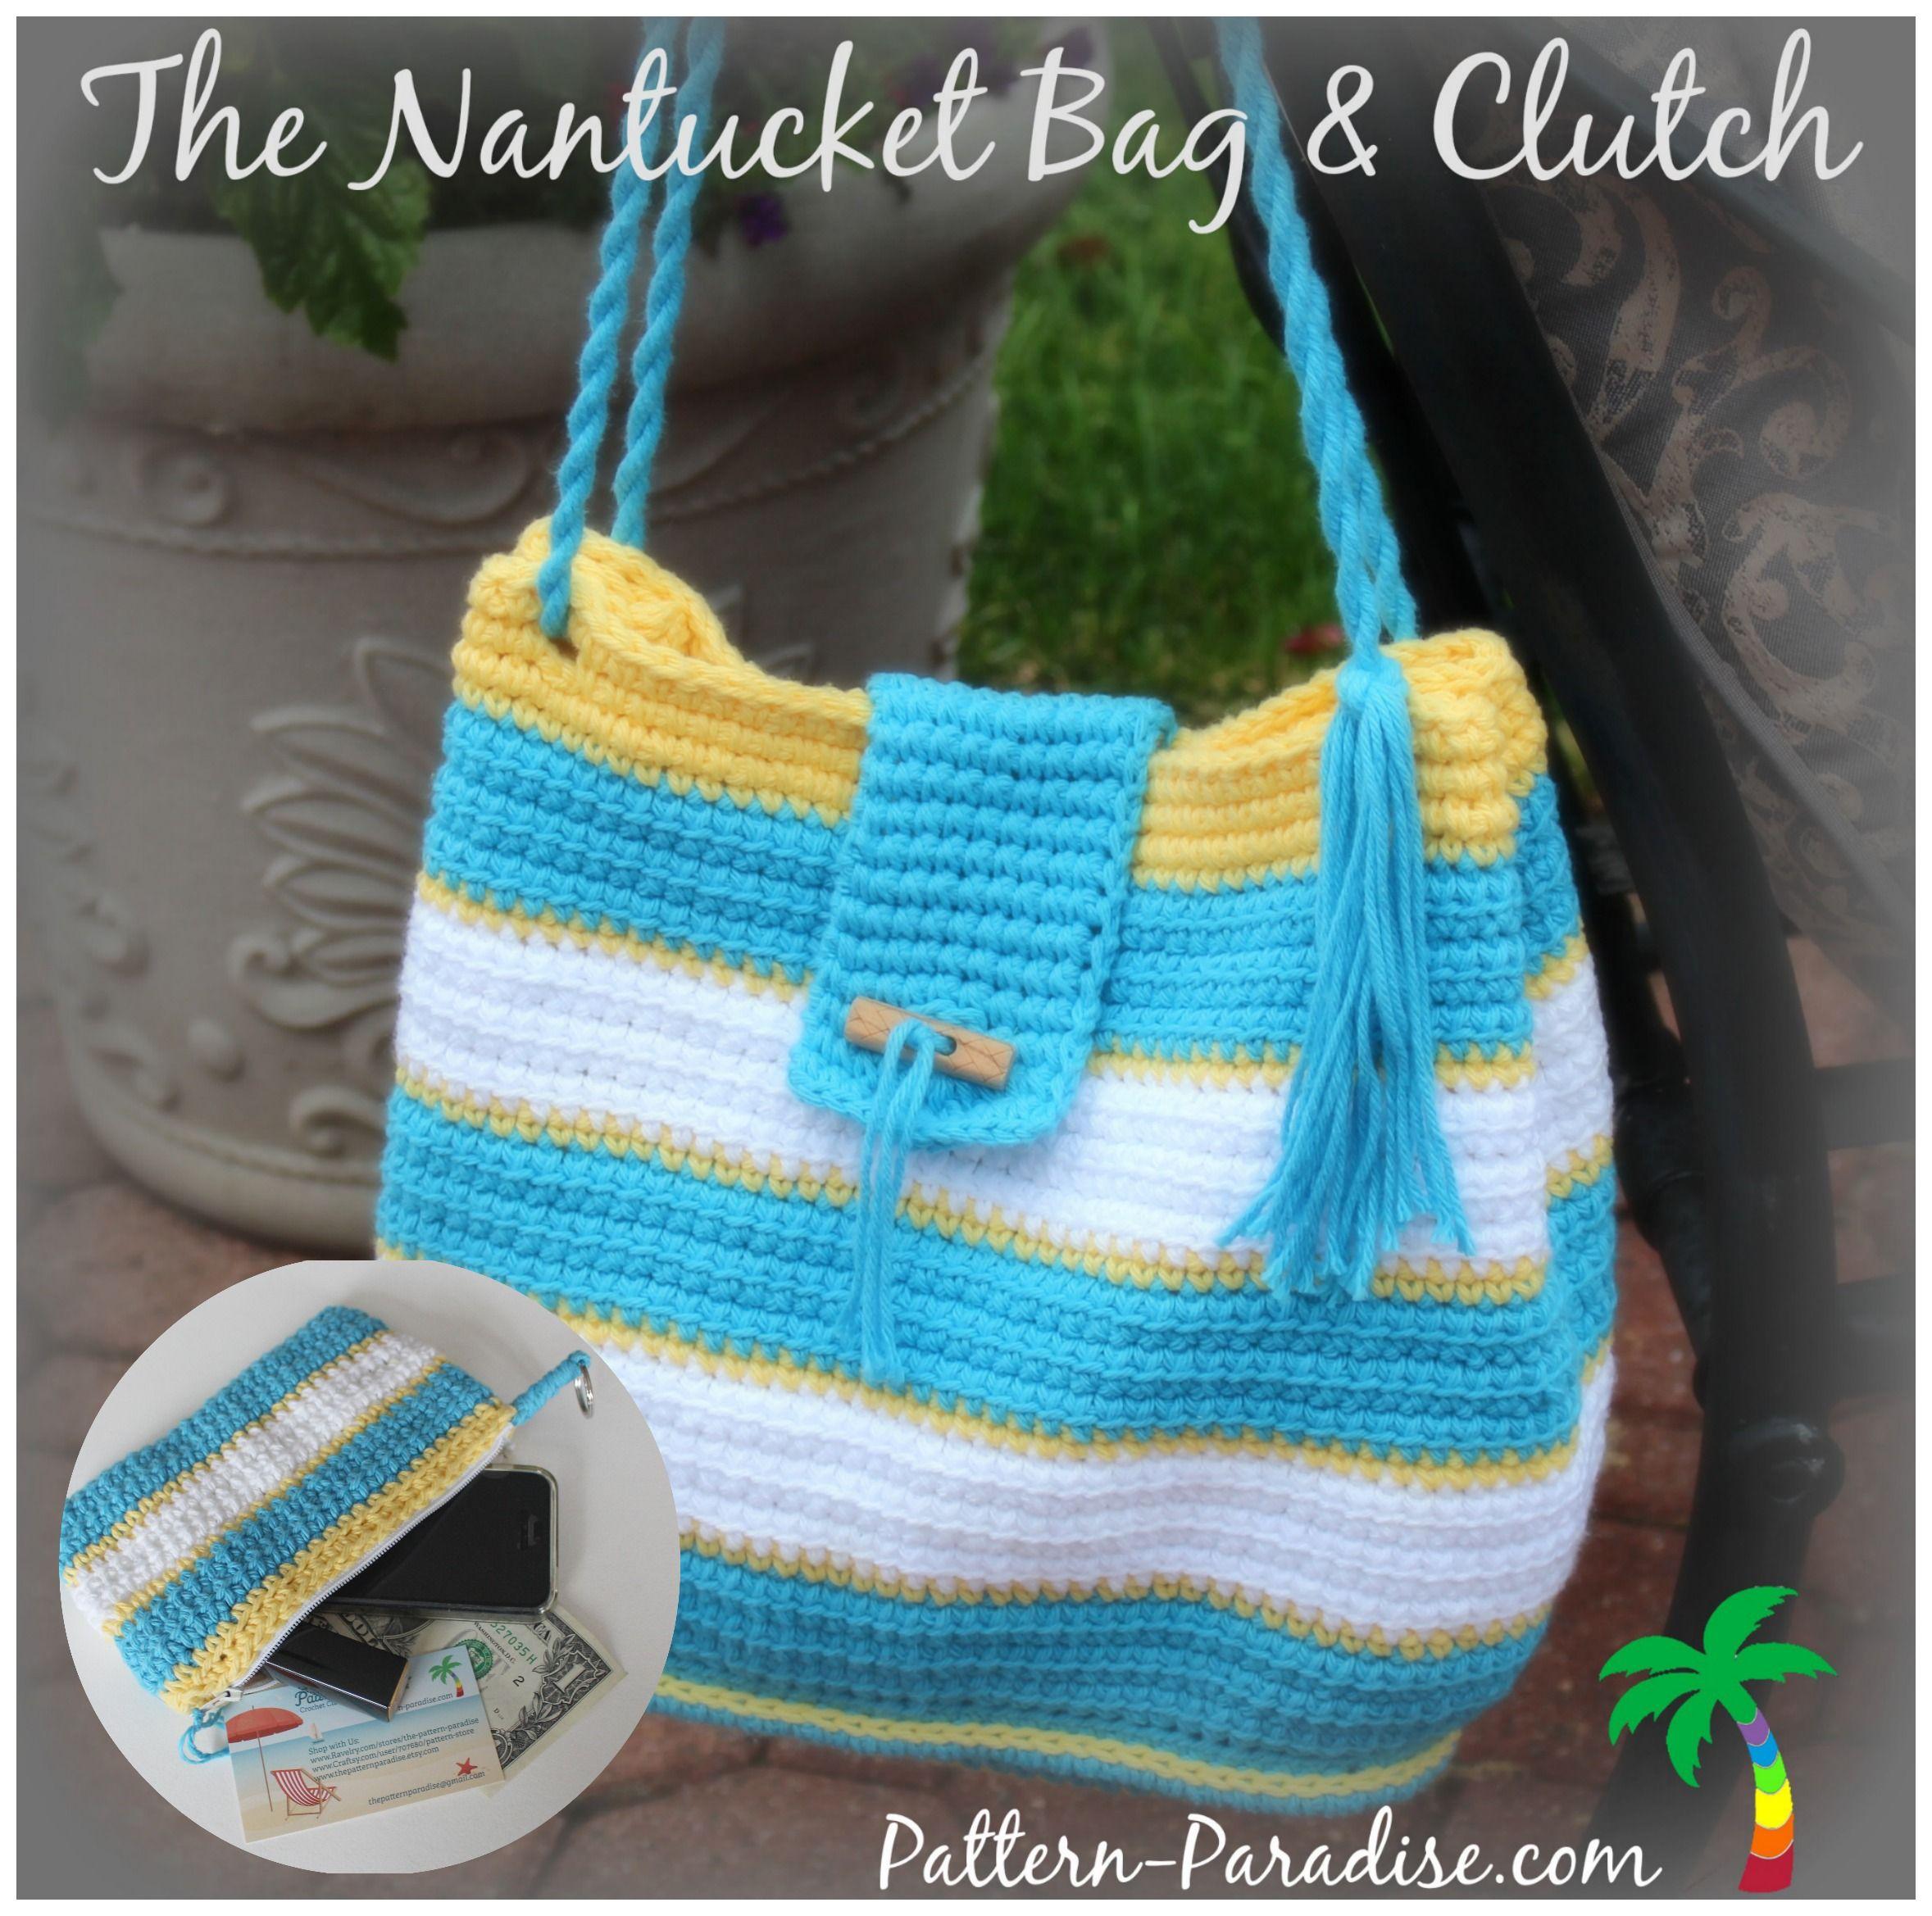 NEW Crochet Pattern - The Nantucket Bag - Pattern Paradise